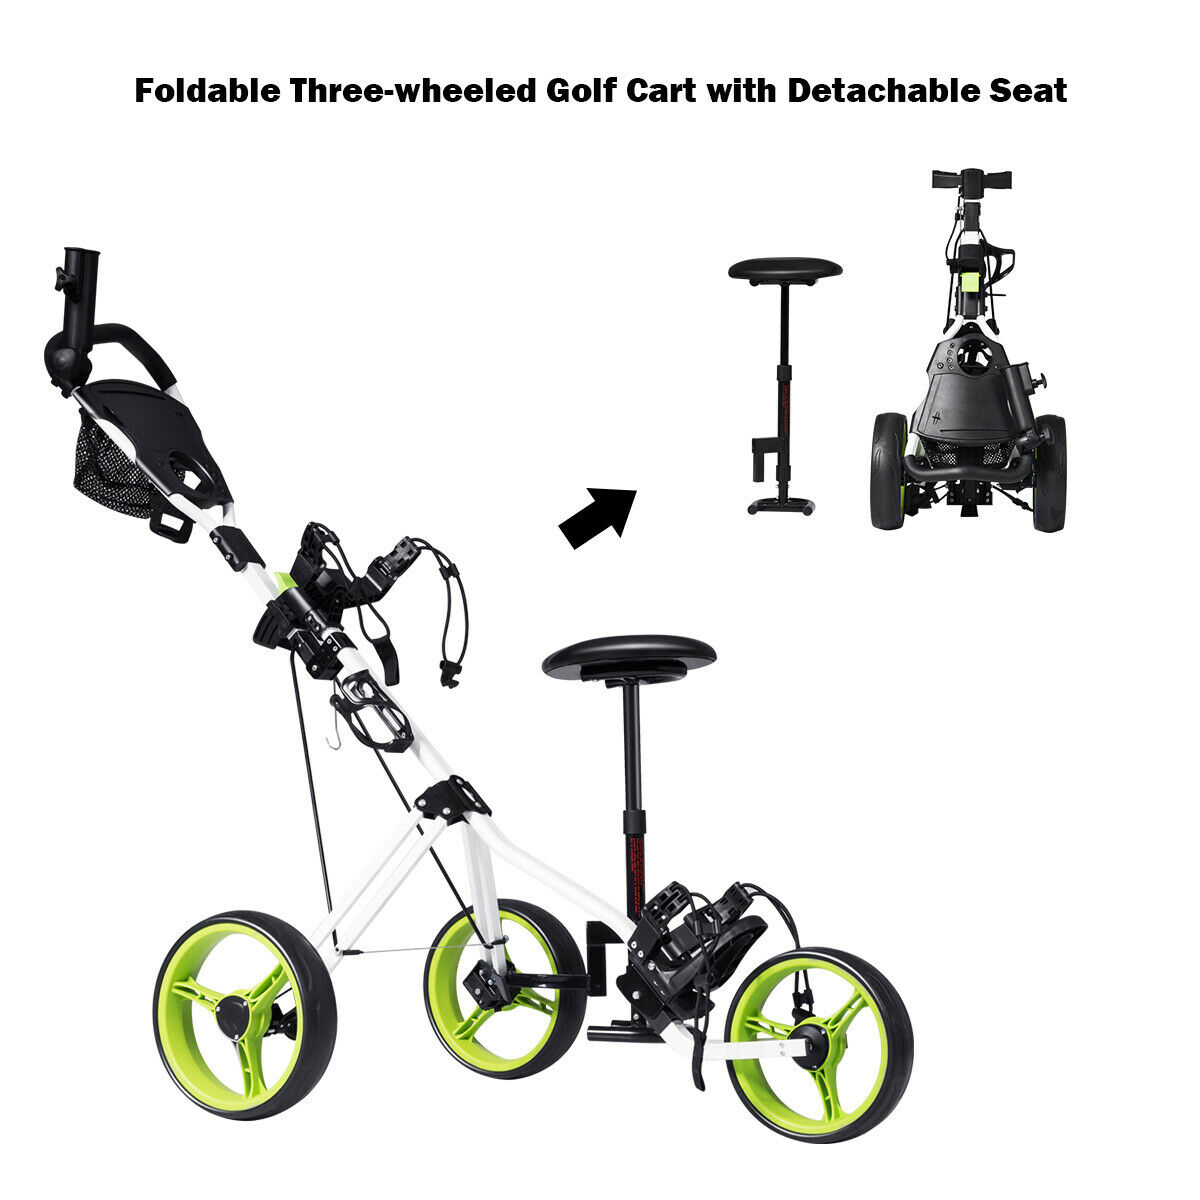 hight resolution of costway foldable 3 wheel push pull golf club cart trolley w seat scoreboard bag swivel walmart com